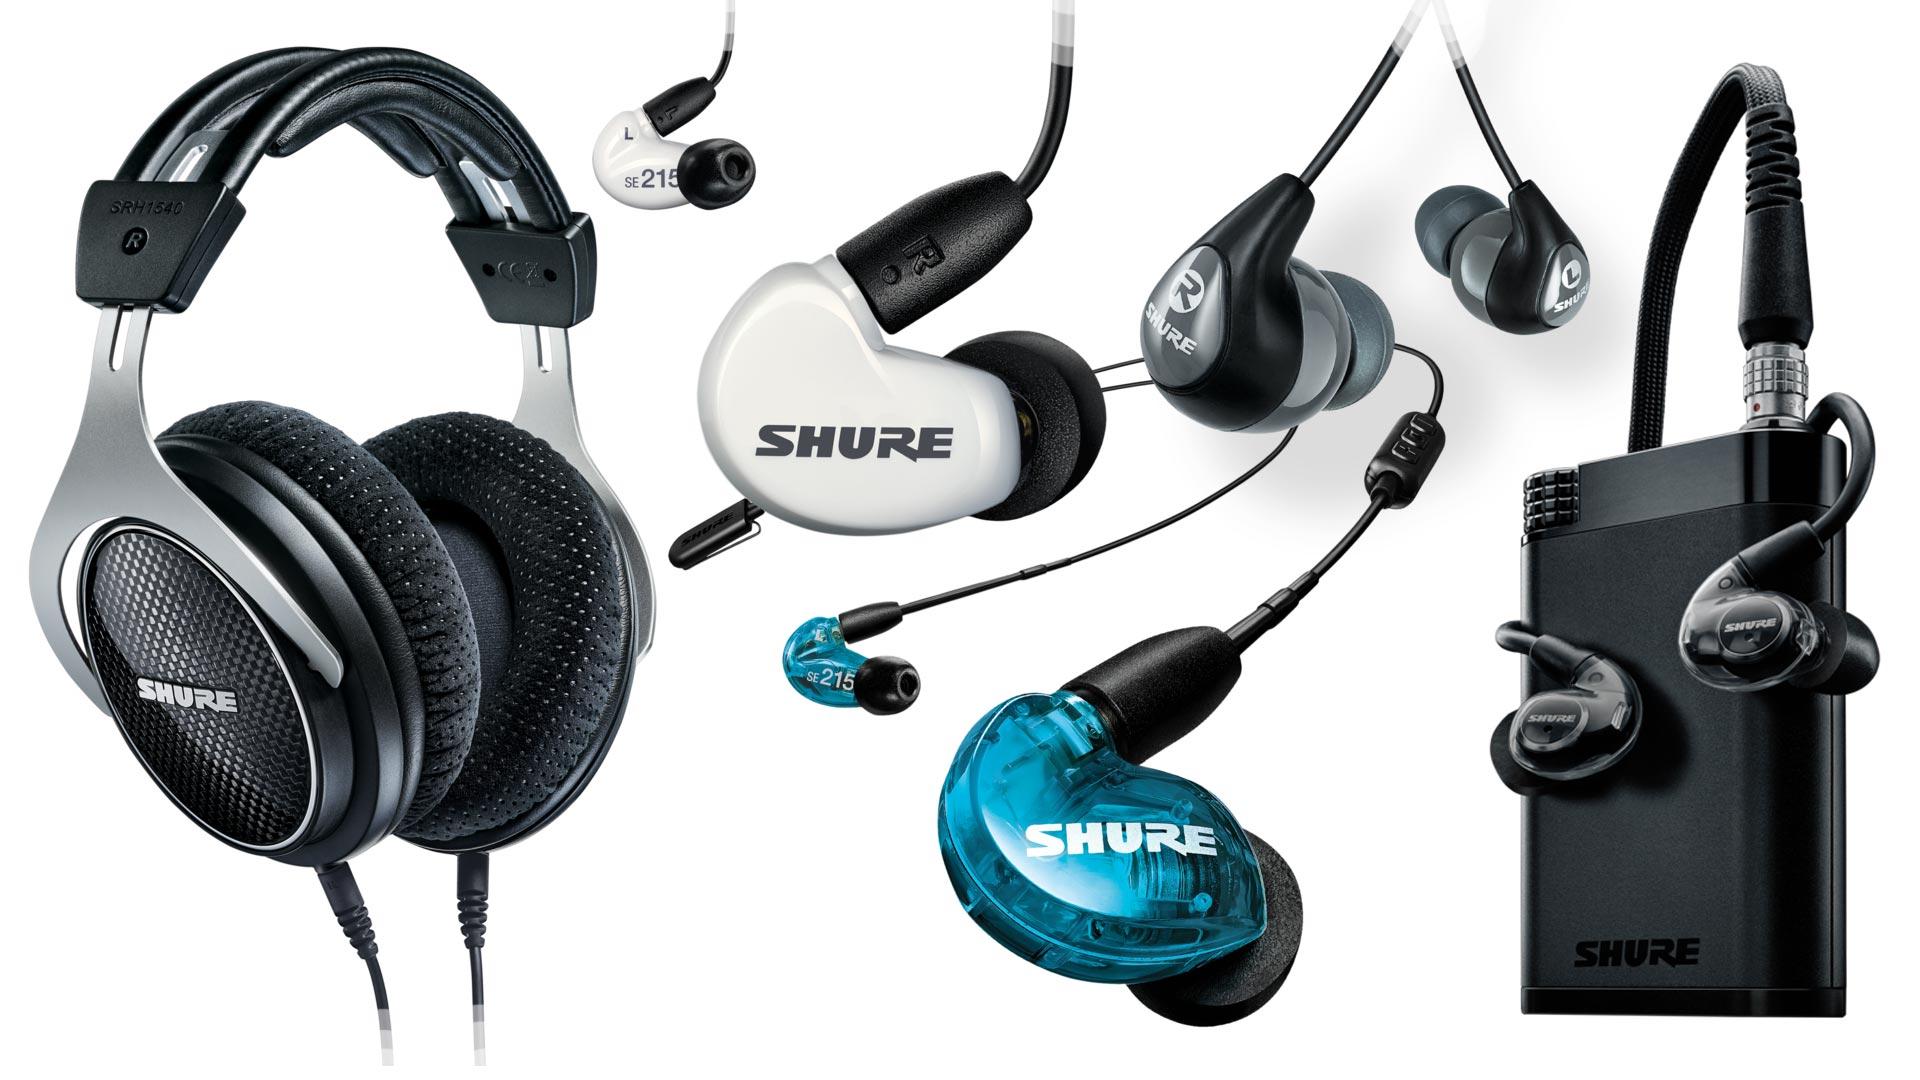 Complete Range Of Shure Headphones & Earphones   Unilet Sound & Vision